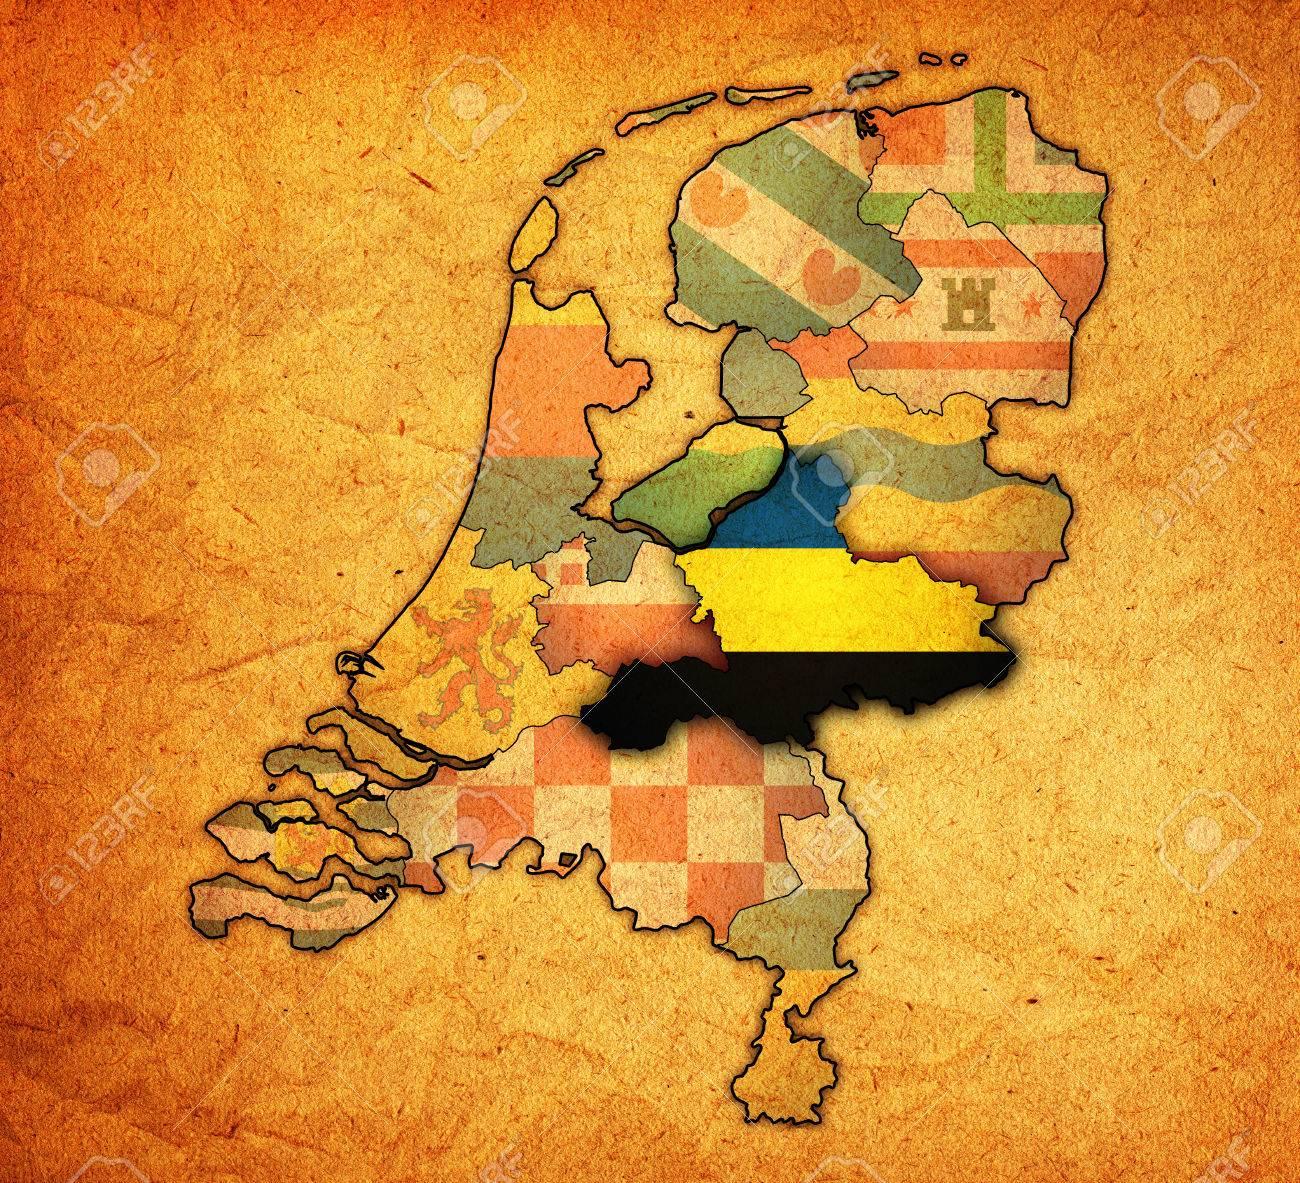 Gelderland Flag On Map With Borders Of Provinces In Netherlands